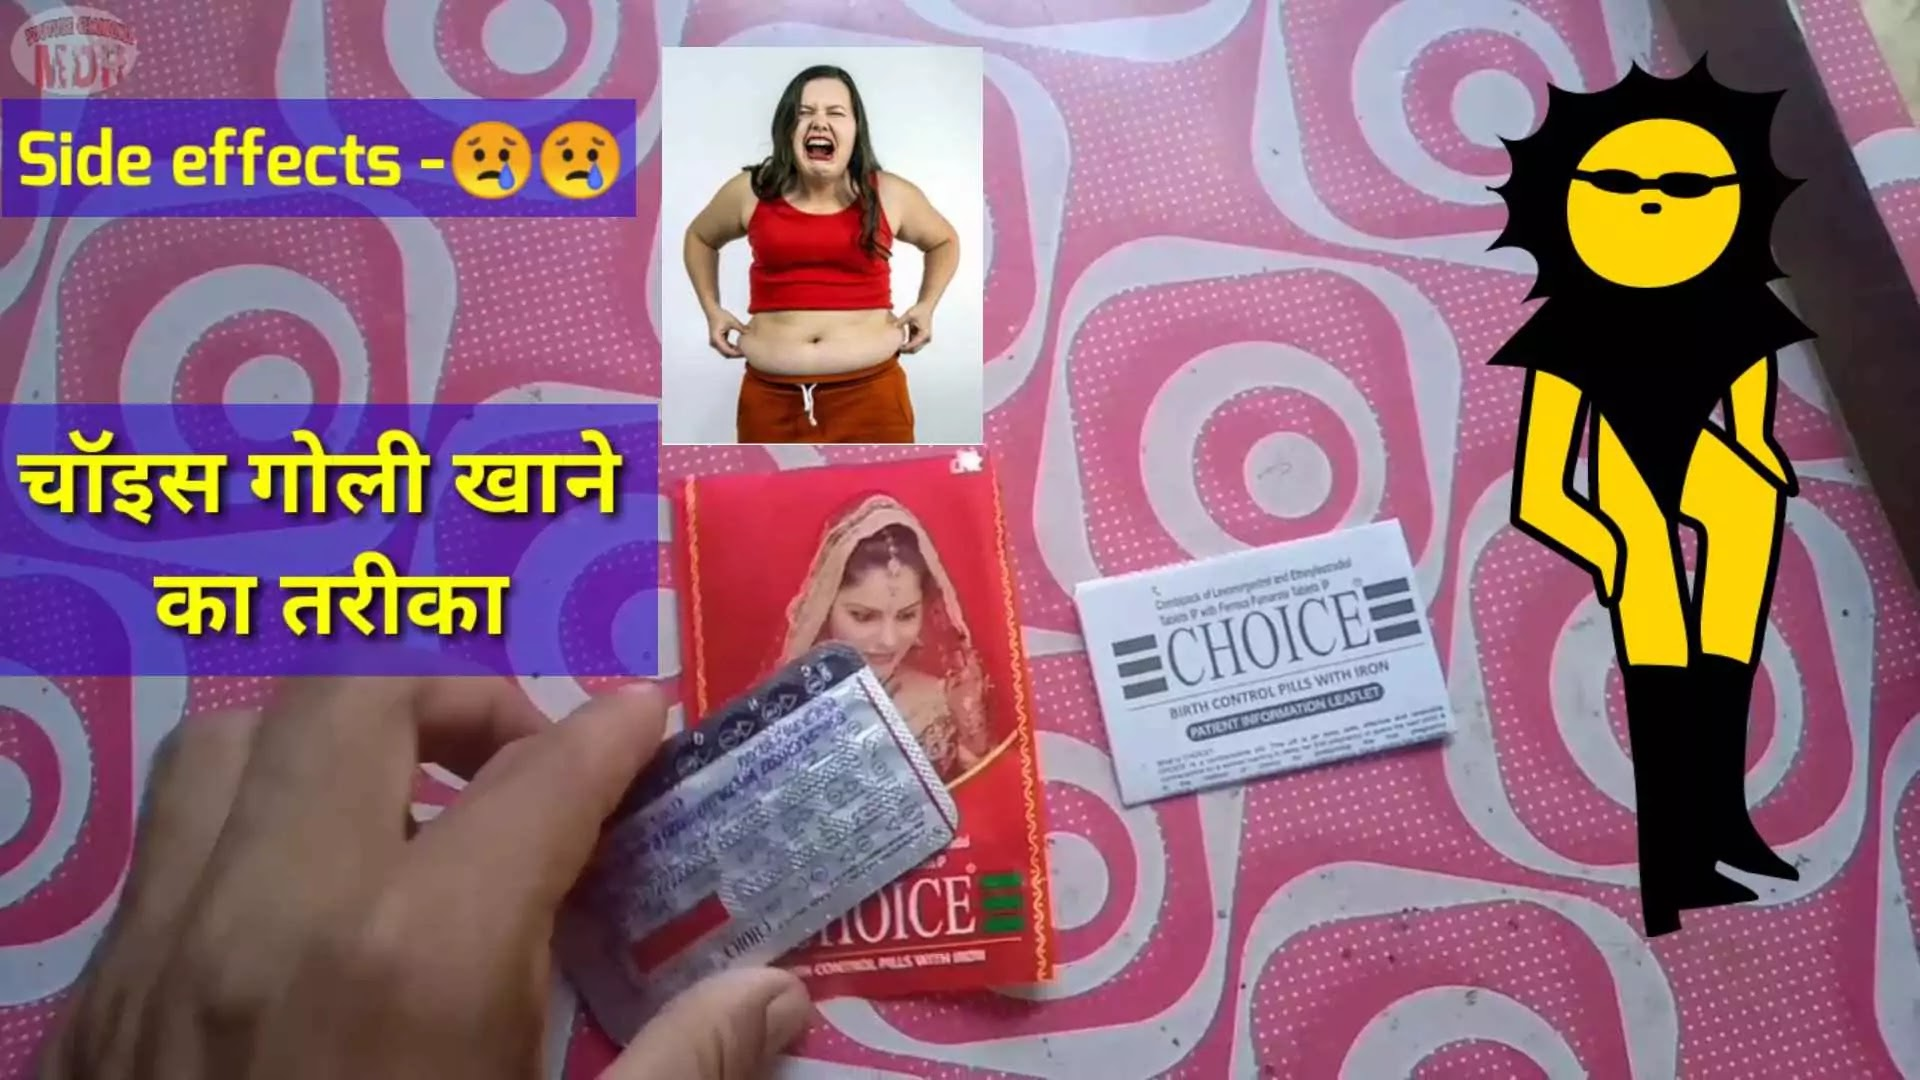 Choice Tablet uses in Hindi, चॉइस गोली खाने का तरीका, Choice tablet use dose & side effects Hindi,